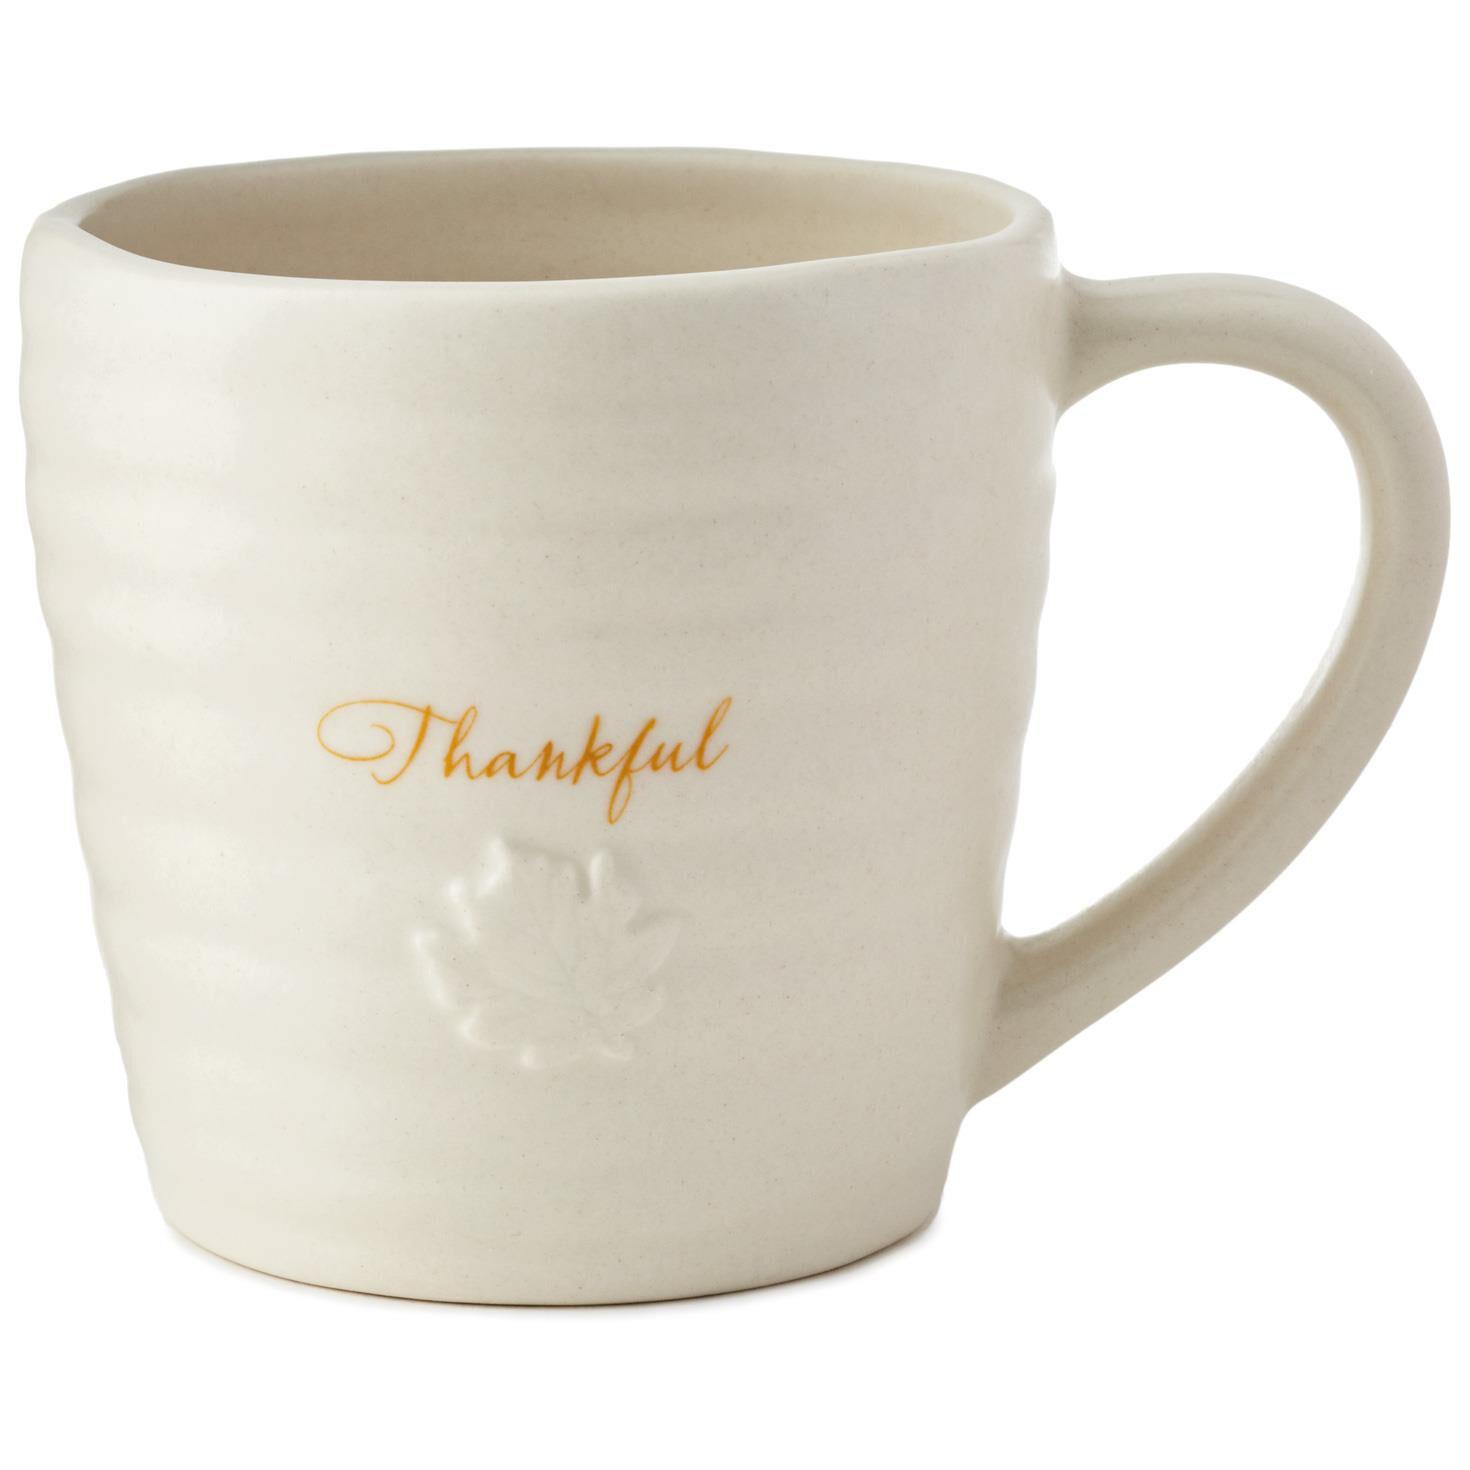 Smiley Face Coffee Mug Coffee Mugs Travel Mugs And Teacups Hallmark